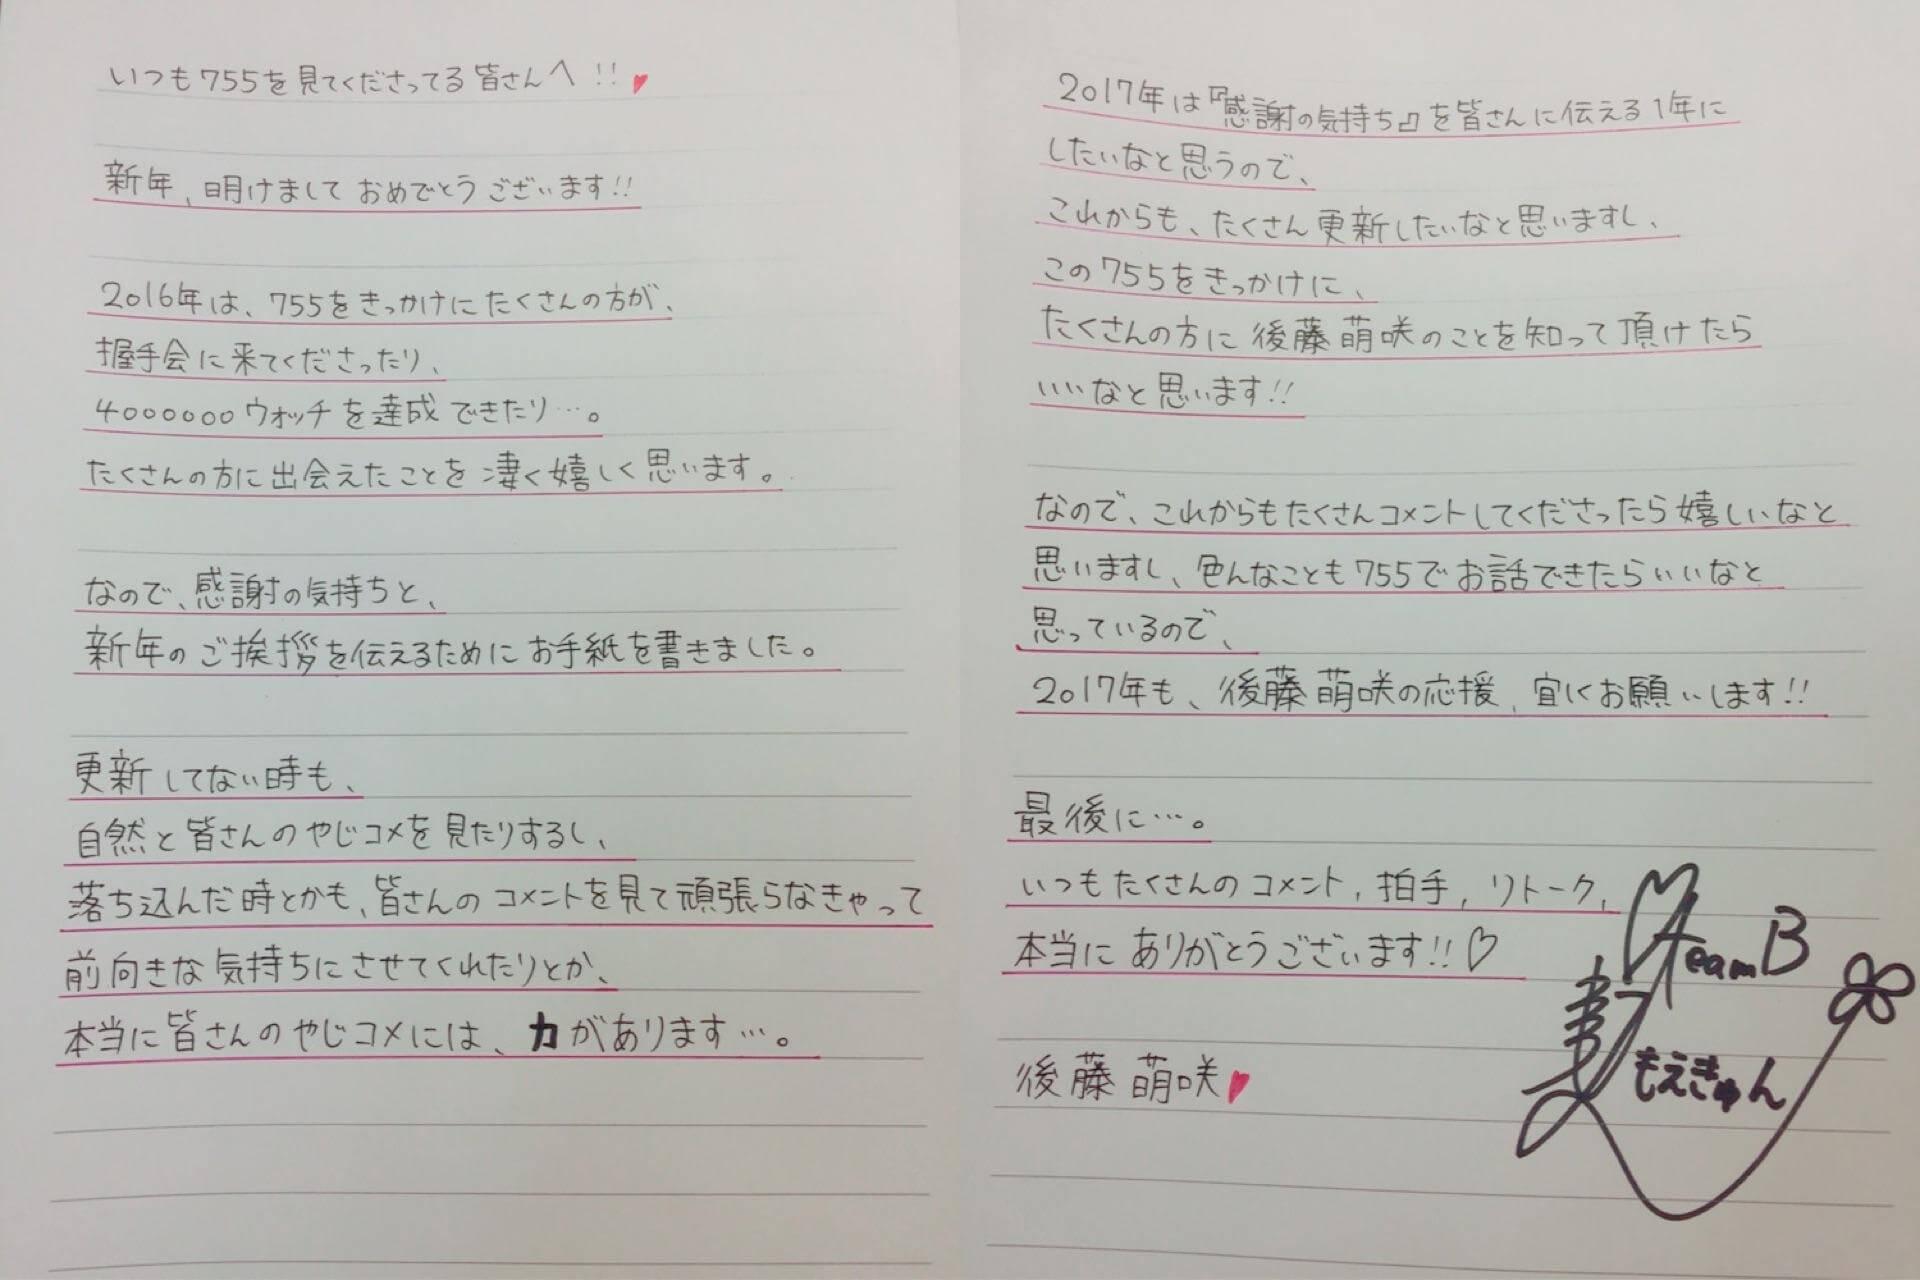 【AKB48】後藤萌咲の性格が素晴らしい(新年にファンに向けての感謝の気持ちを手紙に書き、755で公開)【もえきゅん】